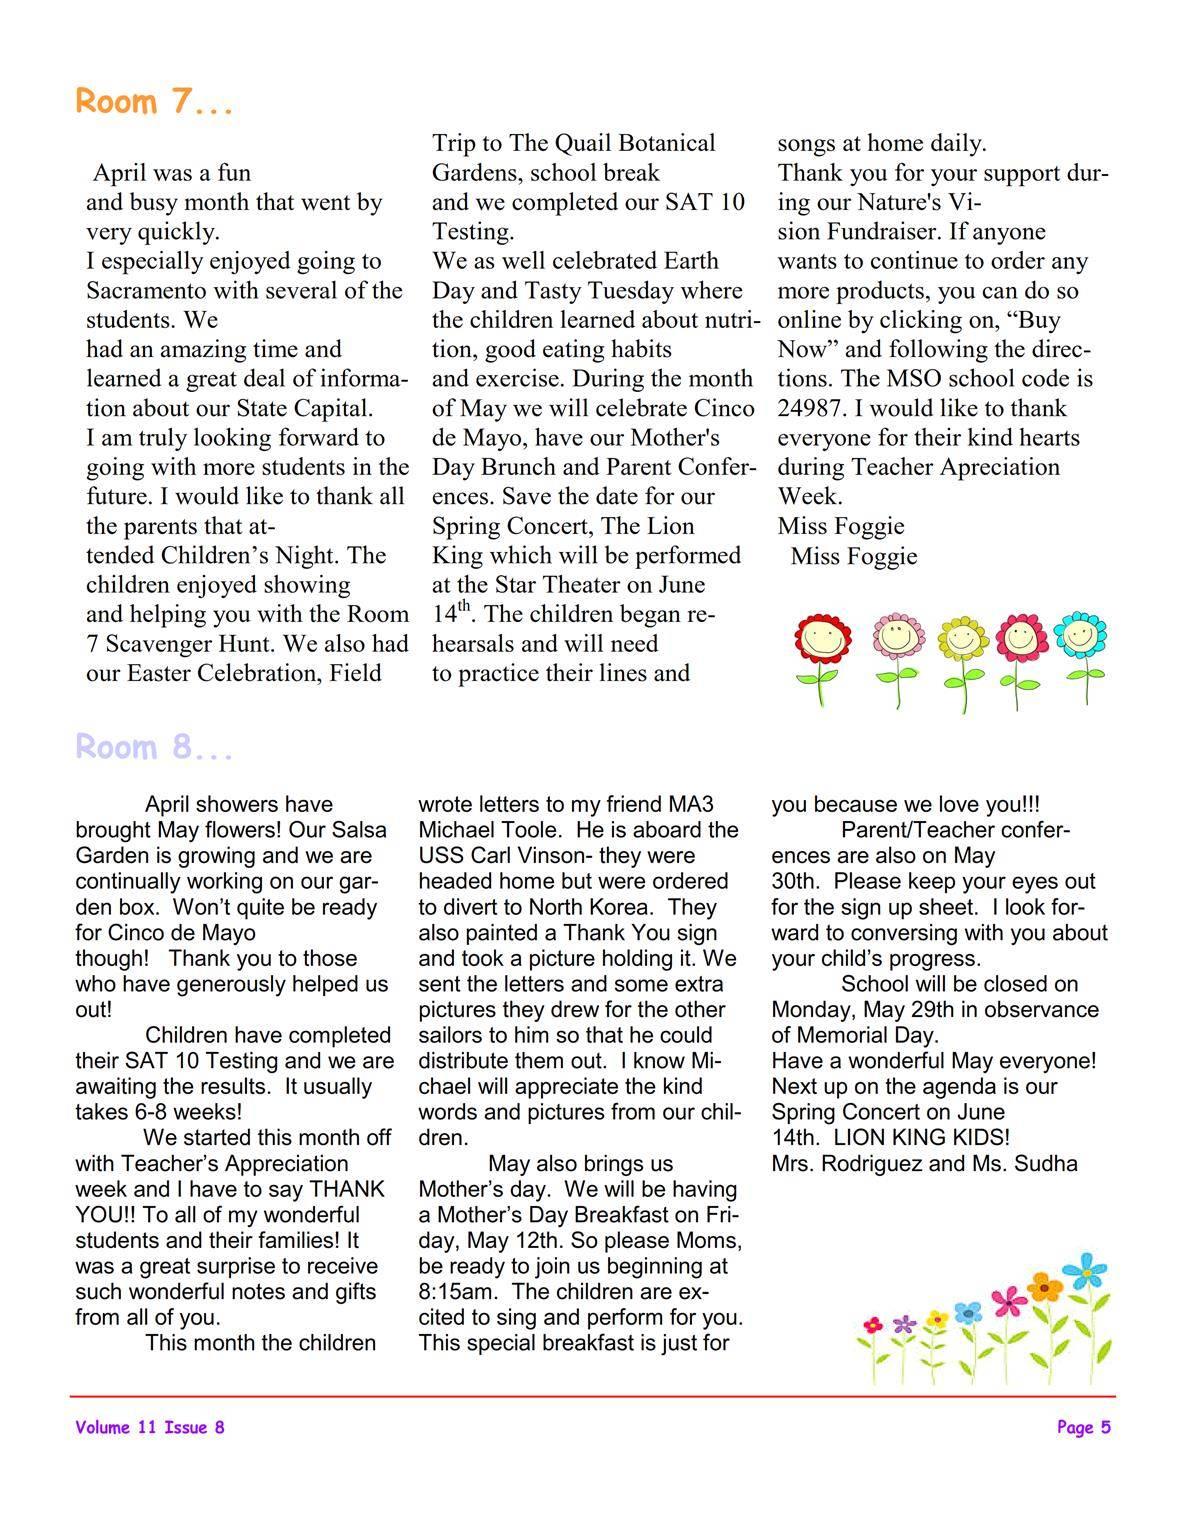 MSO May 2017 Newsletter | Montessori School of Oceanside